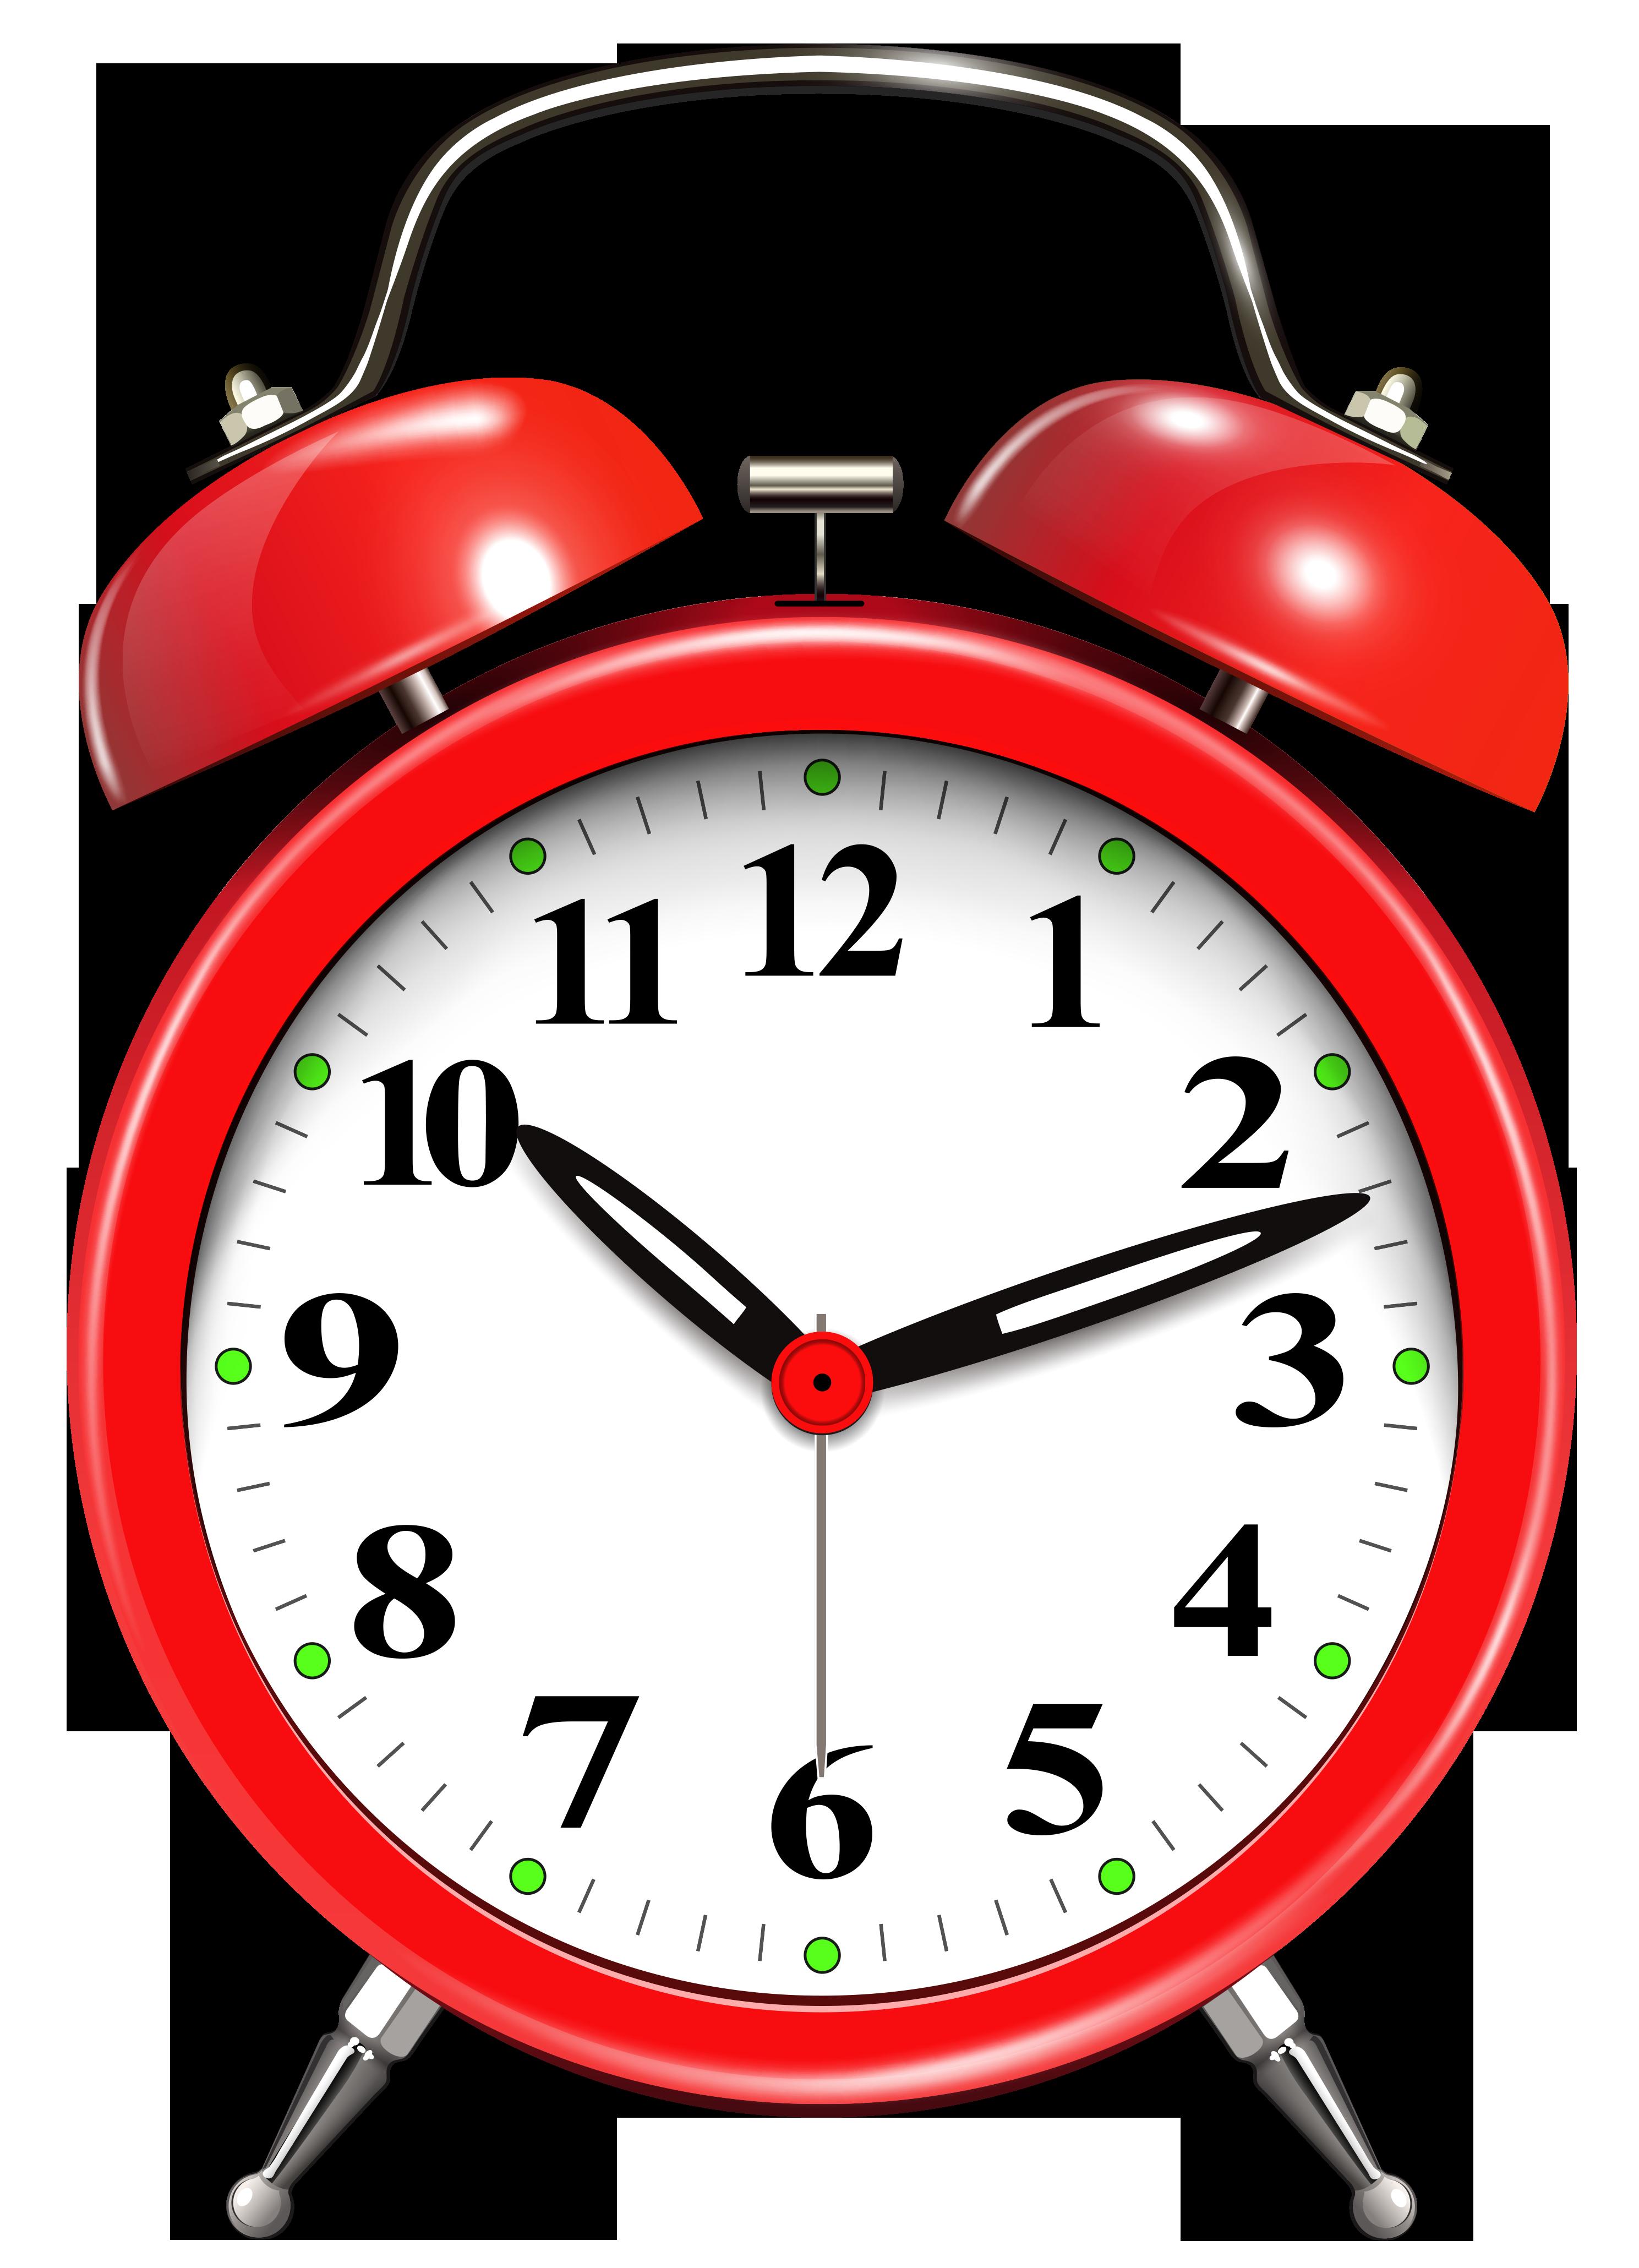 Image of clock clipart 1 alarm .-Image of clock clipart 1 alarm .-6